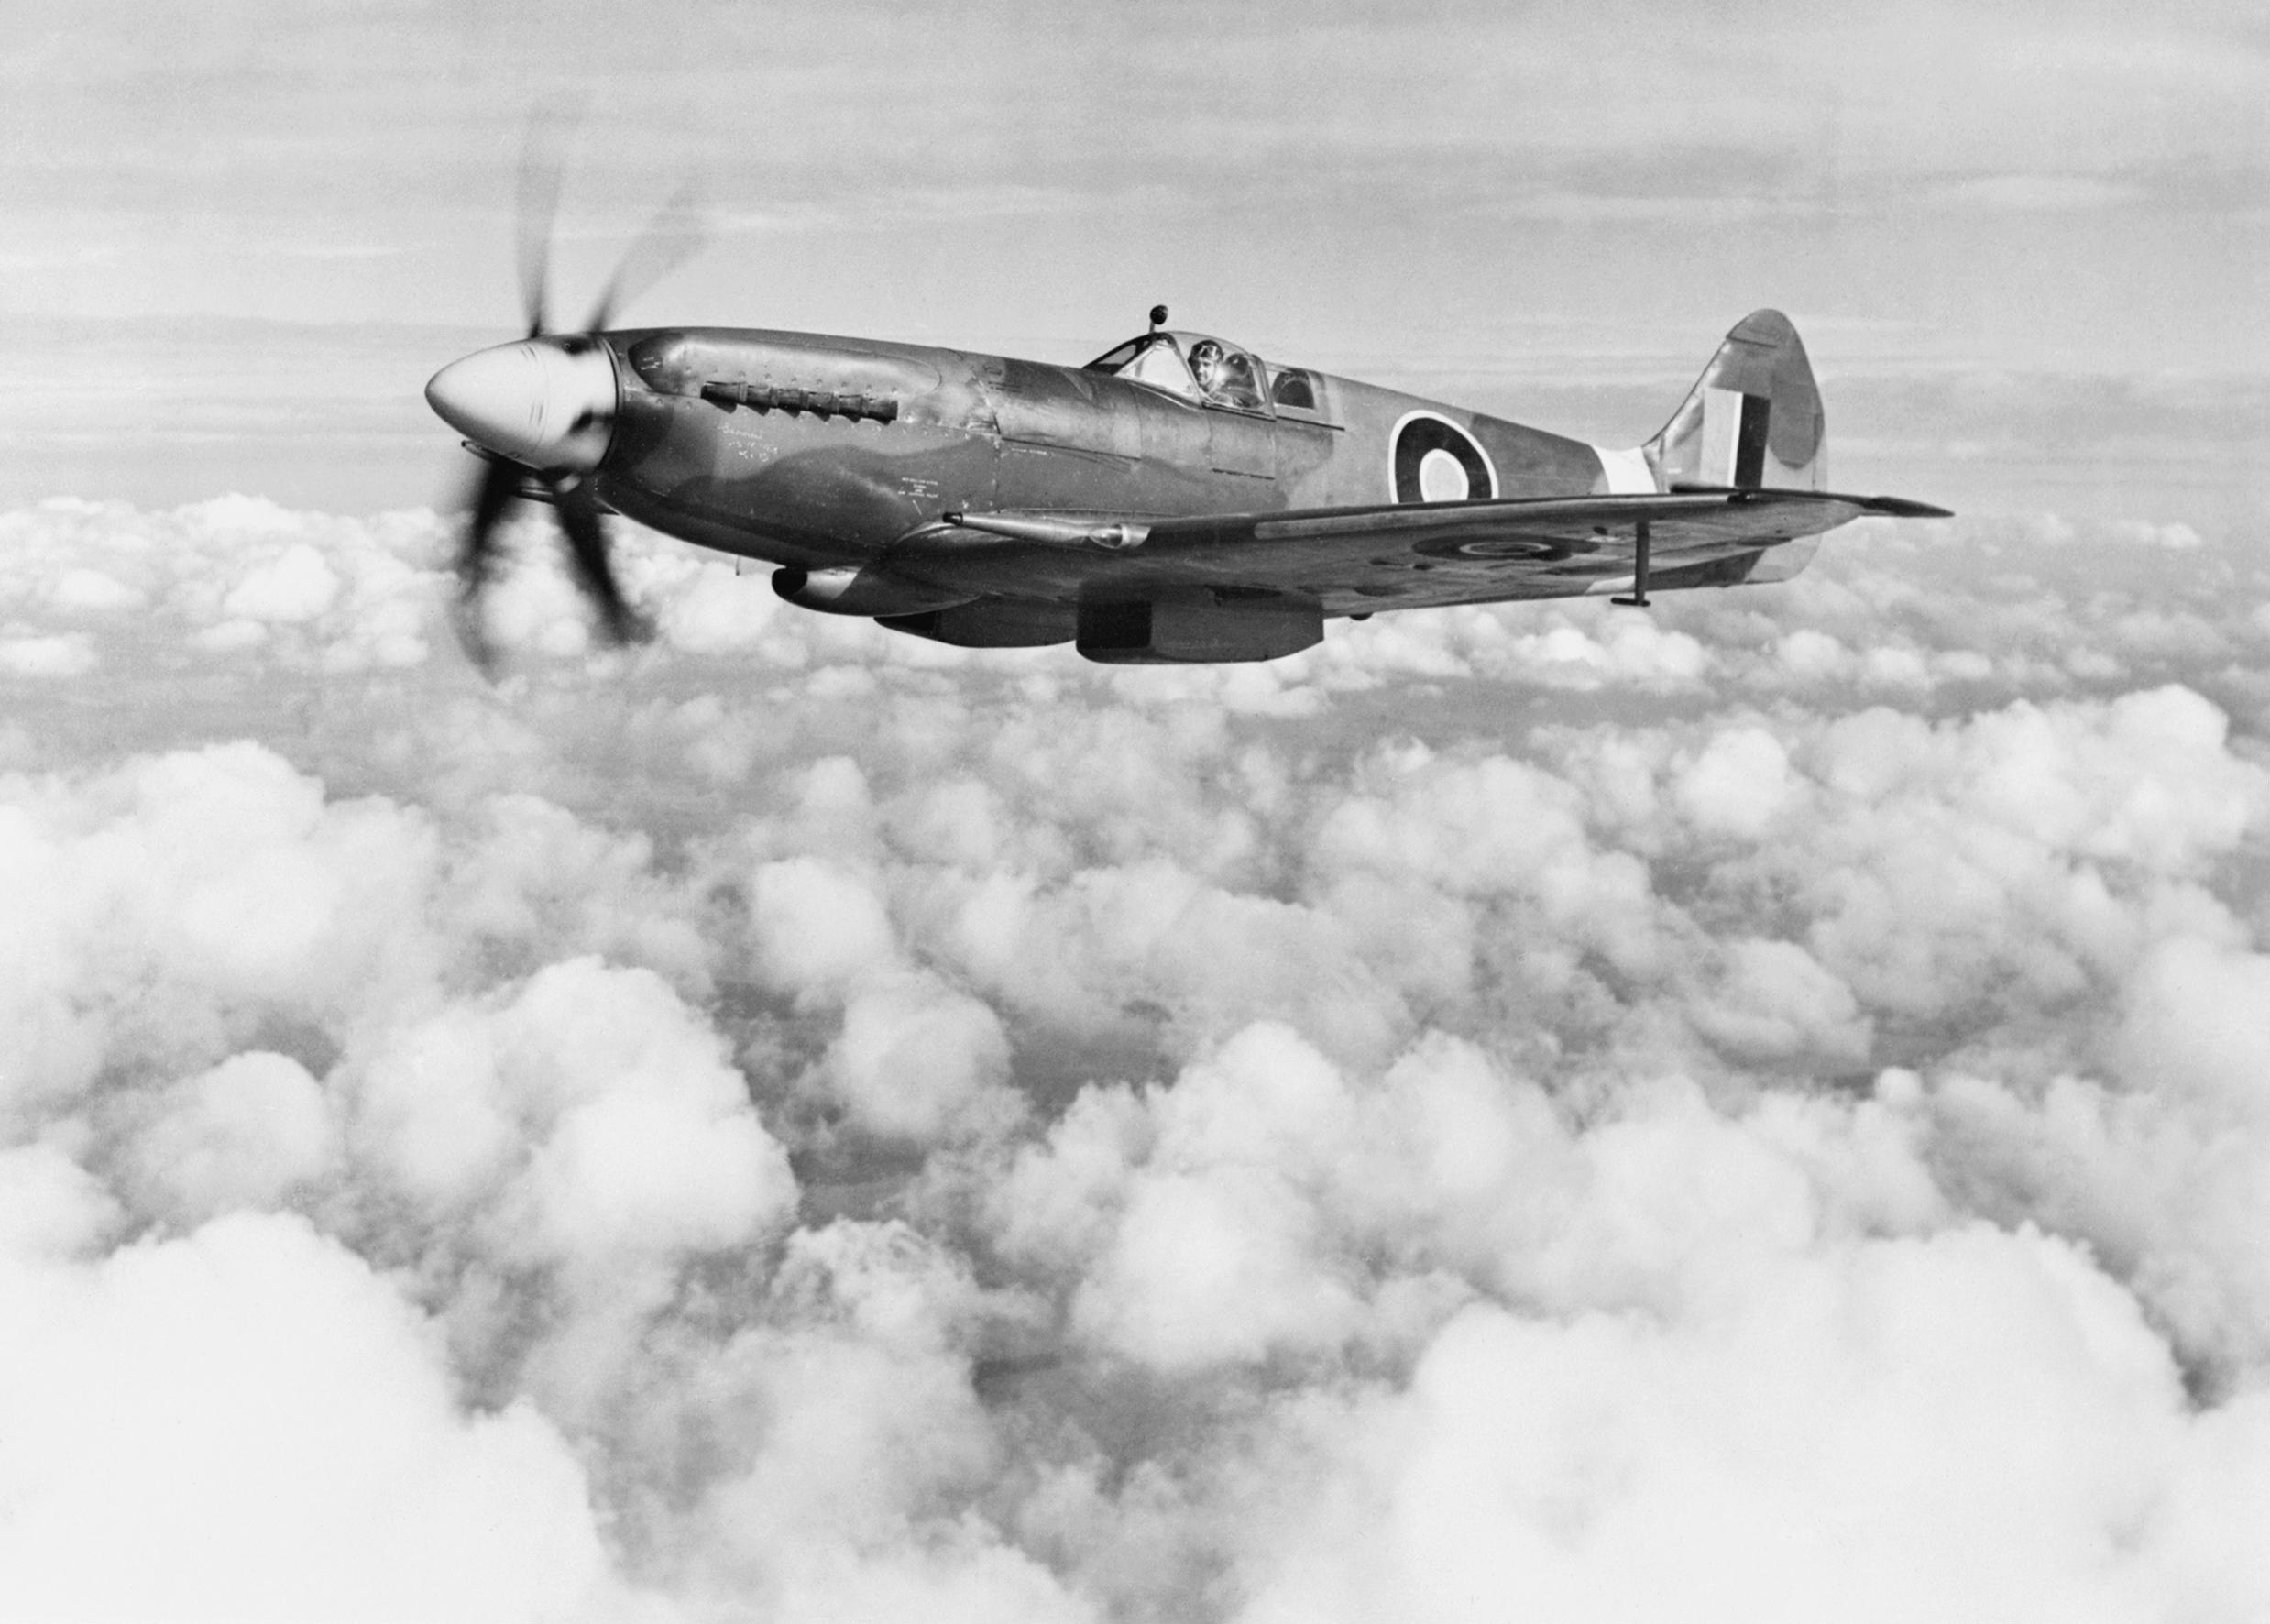 Supermarine_Spitfire_Mk_XIVe_RB140_in_Ma